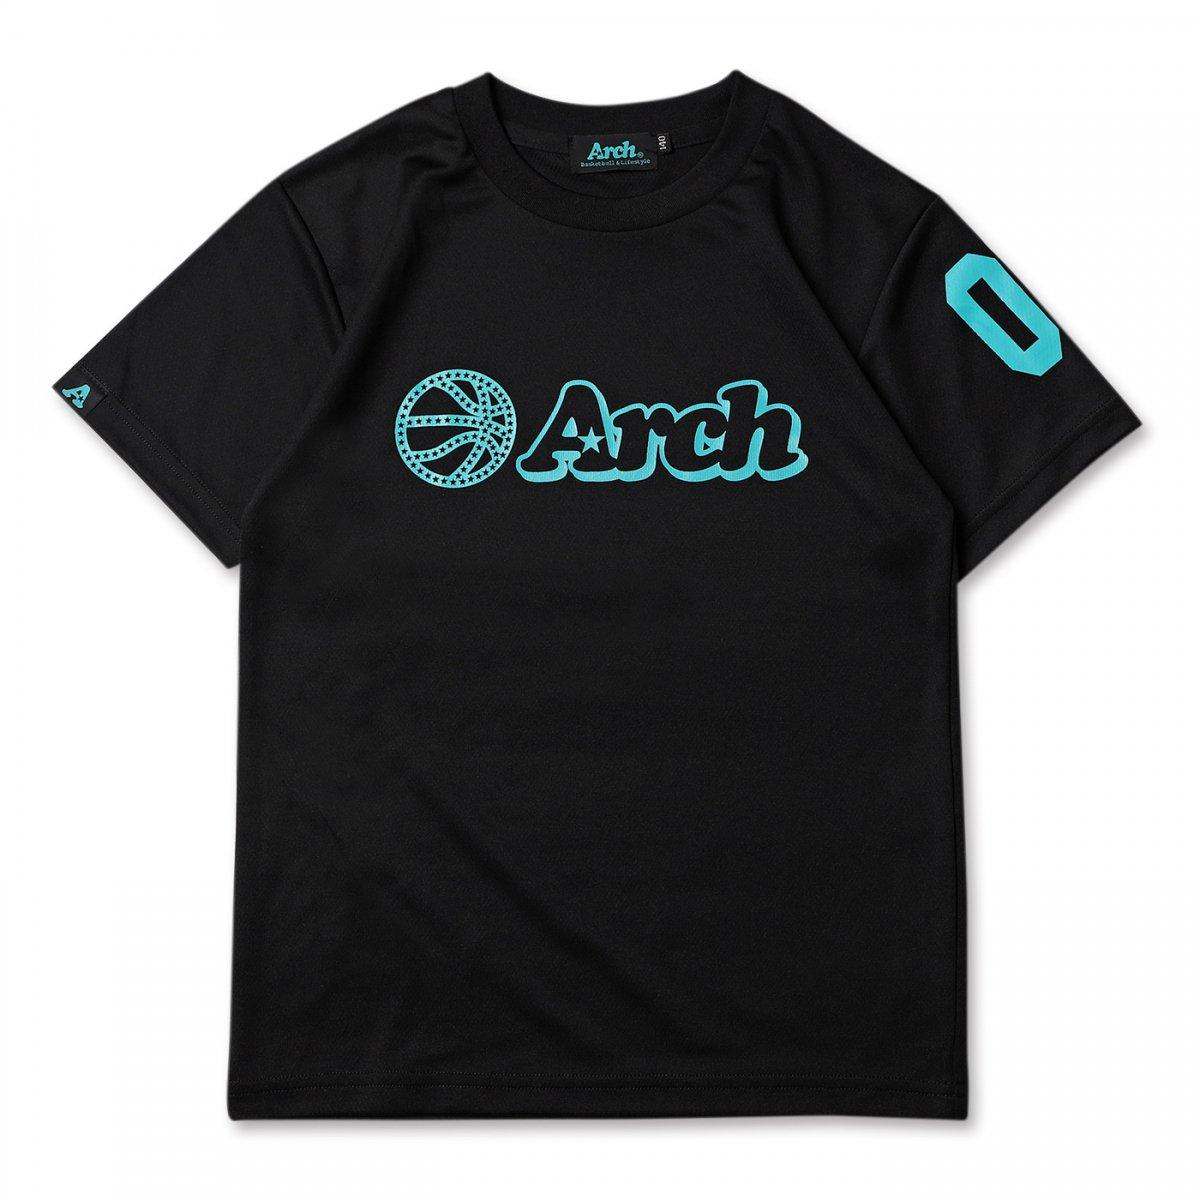 ball logo tee [DRY][KIDS]【black/turquoise】